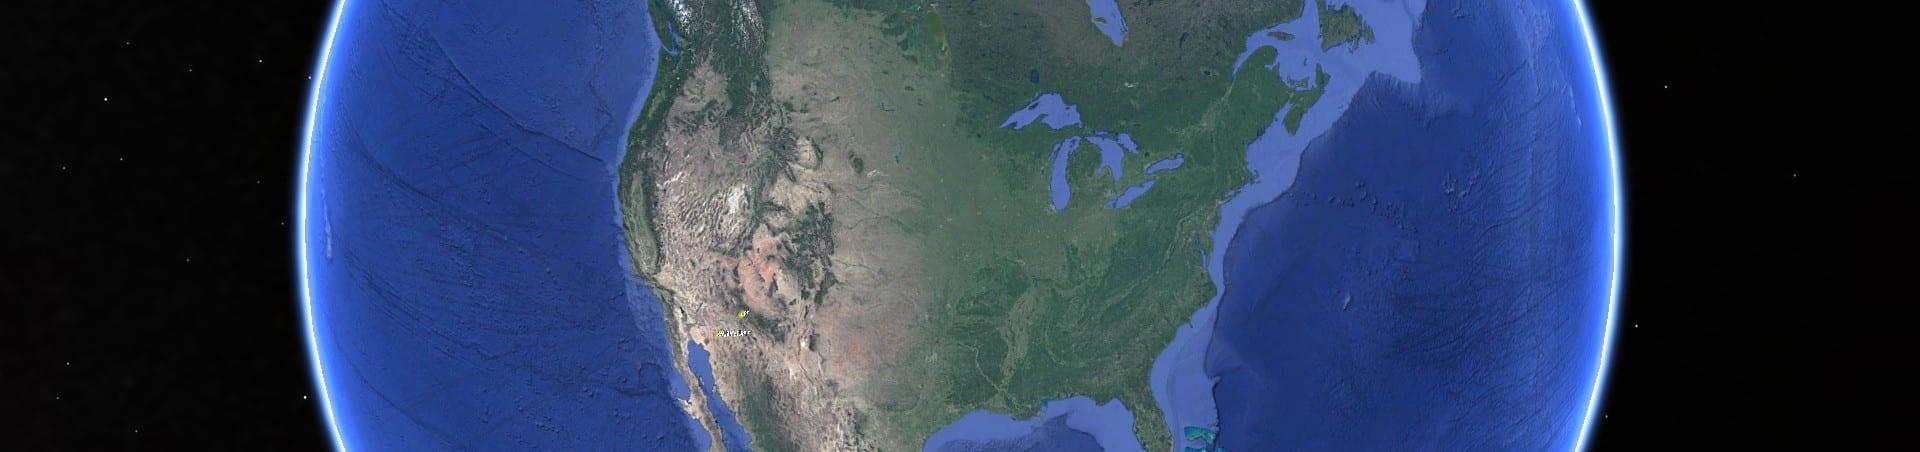 Nordamerika aus dem All